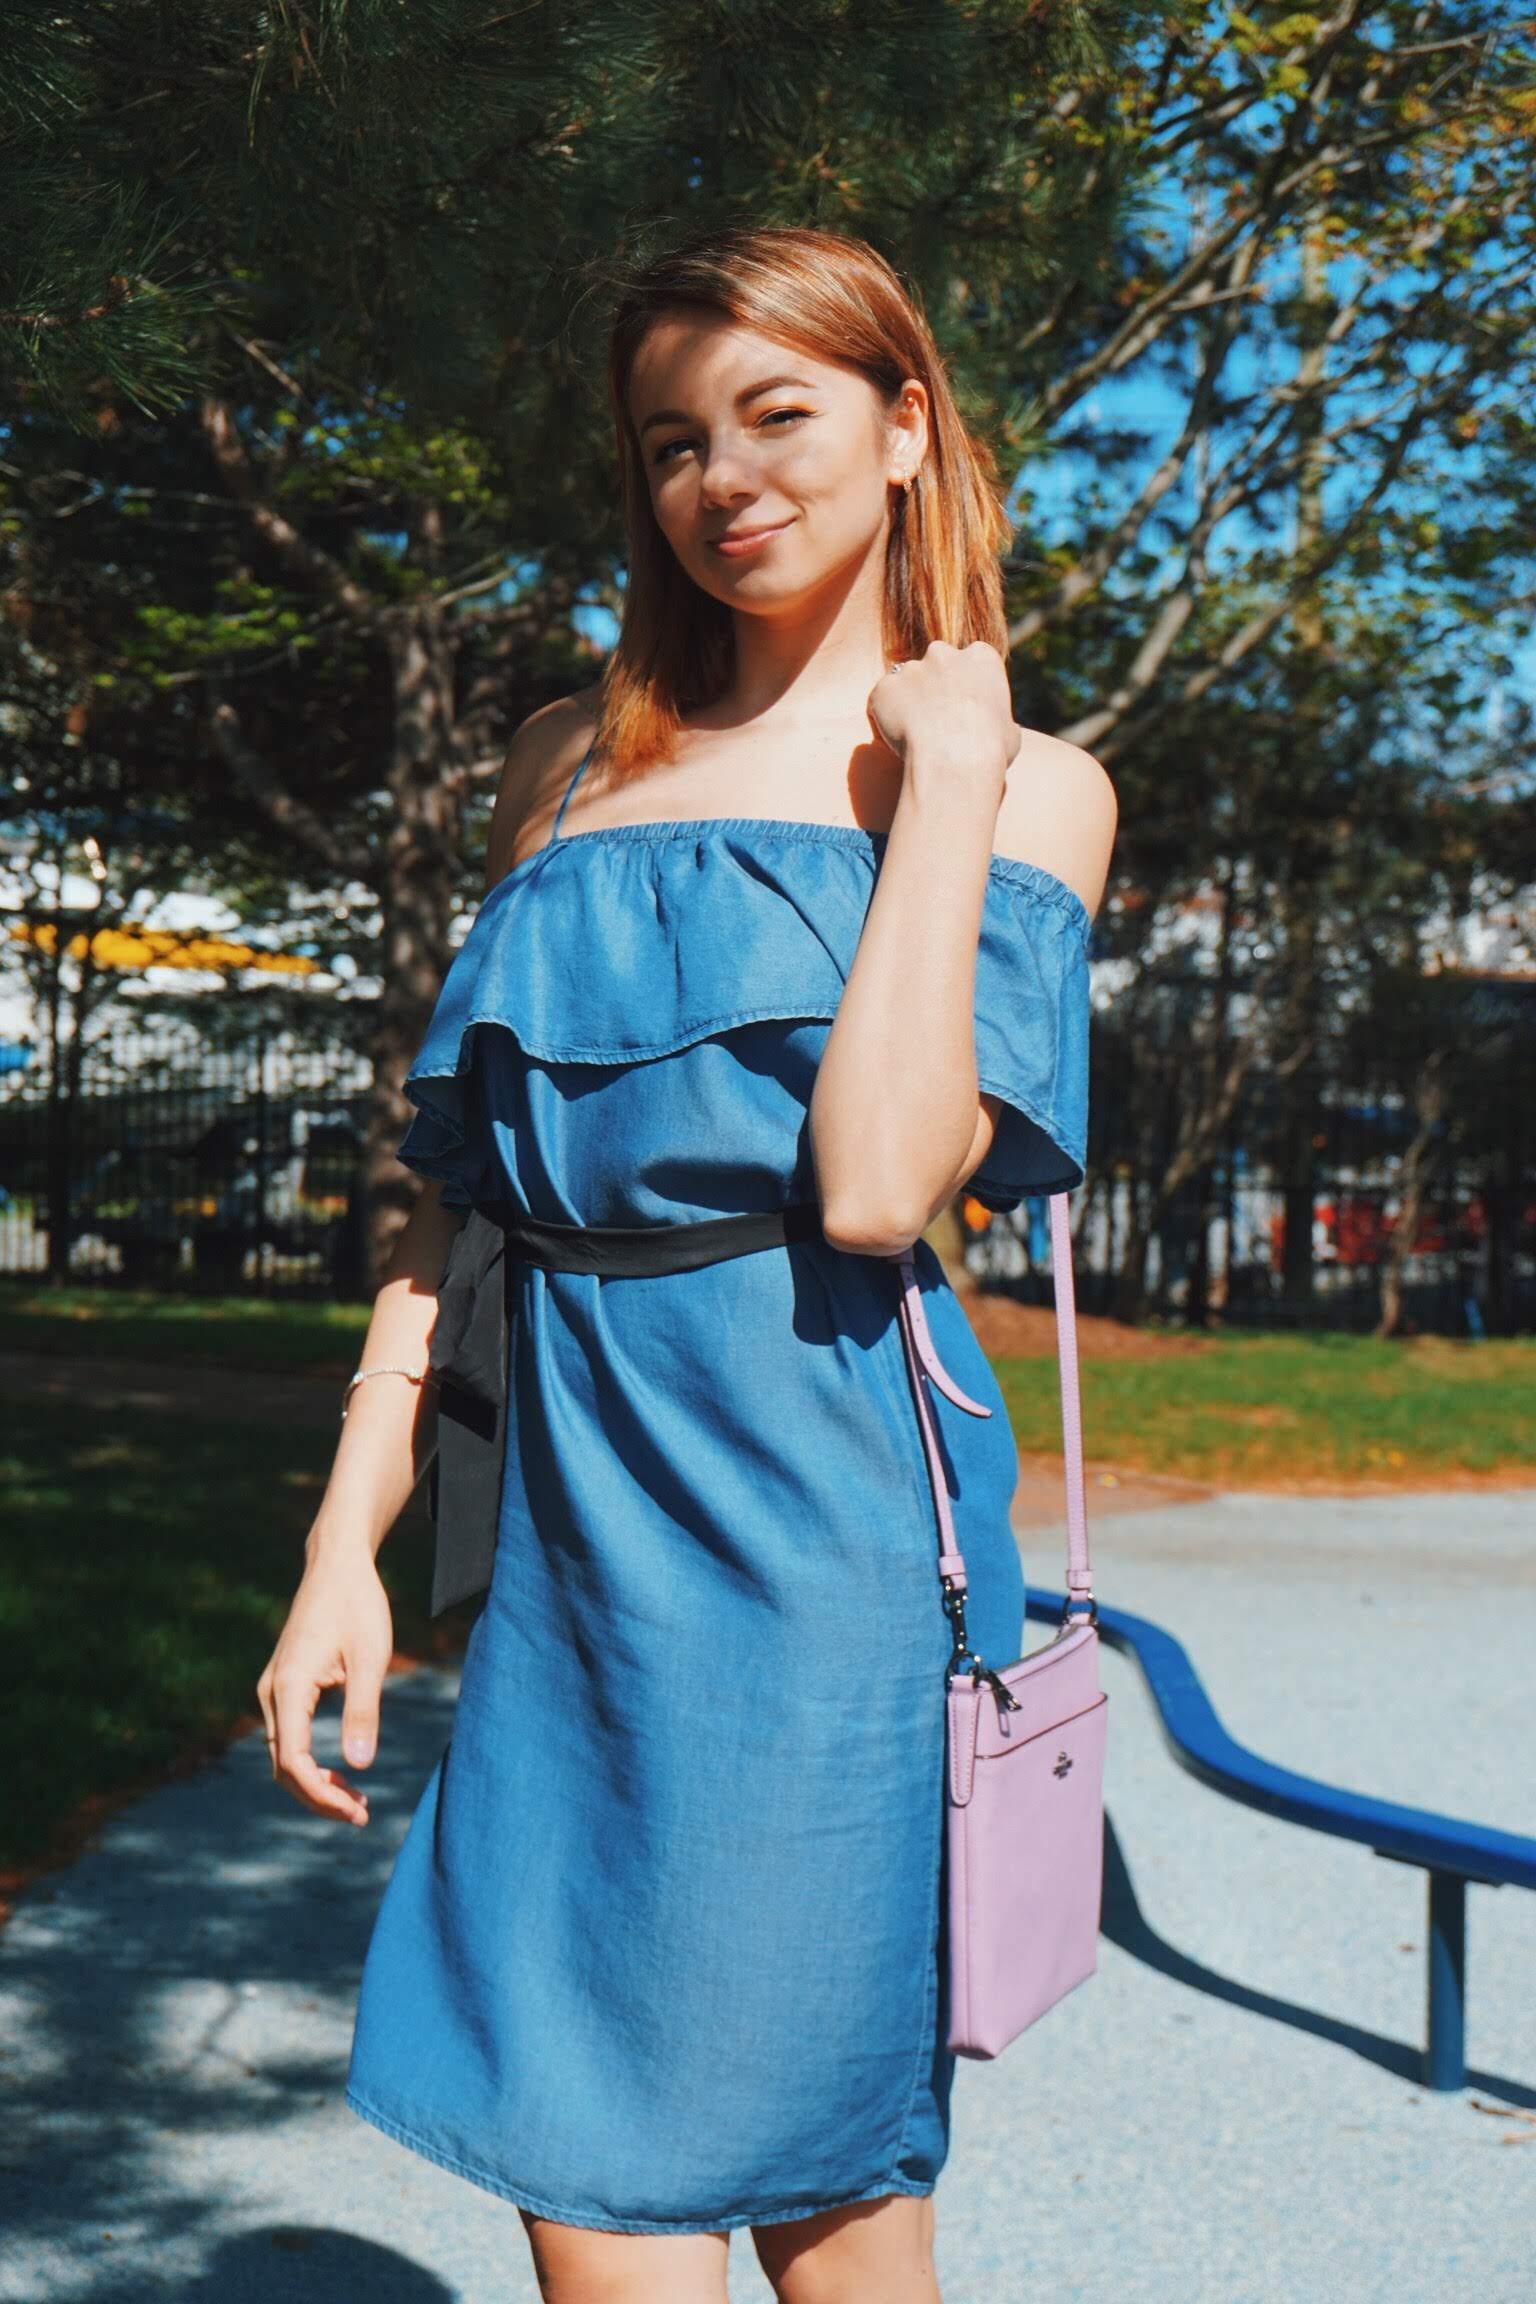 A girl wearing a cute denim summer dress, and a lilac Coach bag.